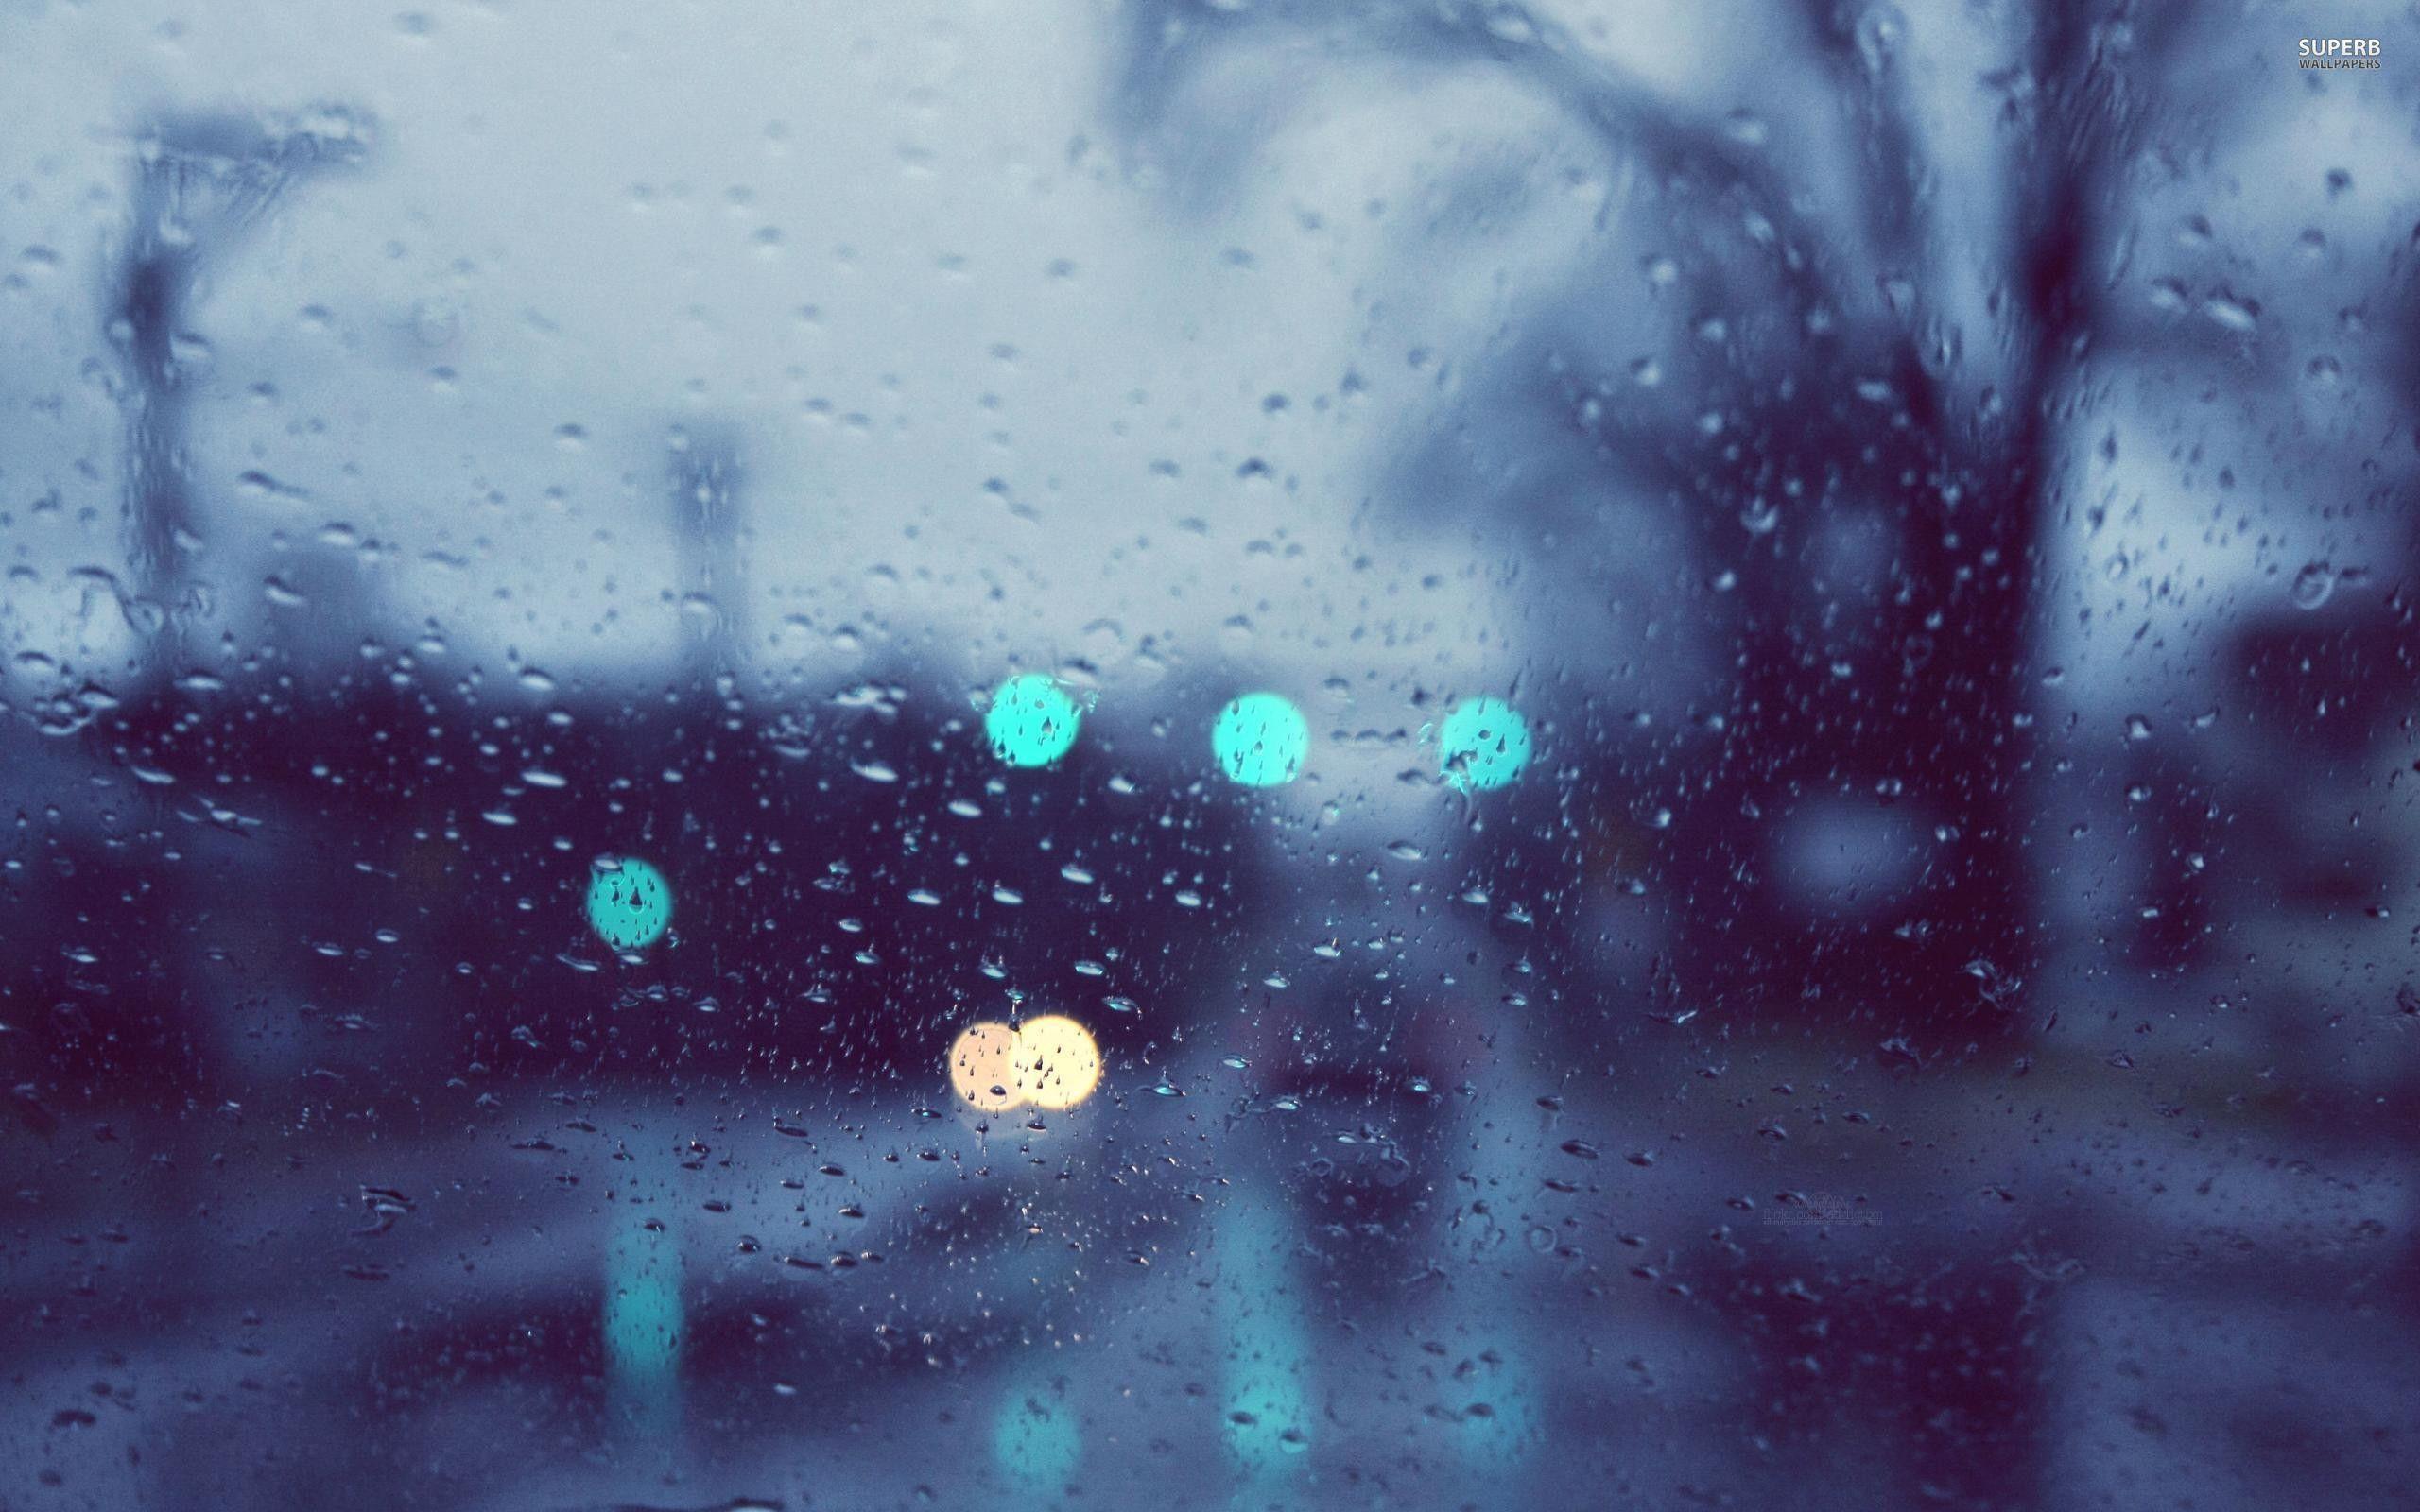 Aesthetic Rain Wallpapers Top Free Aesthetic Rain